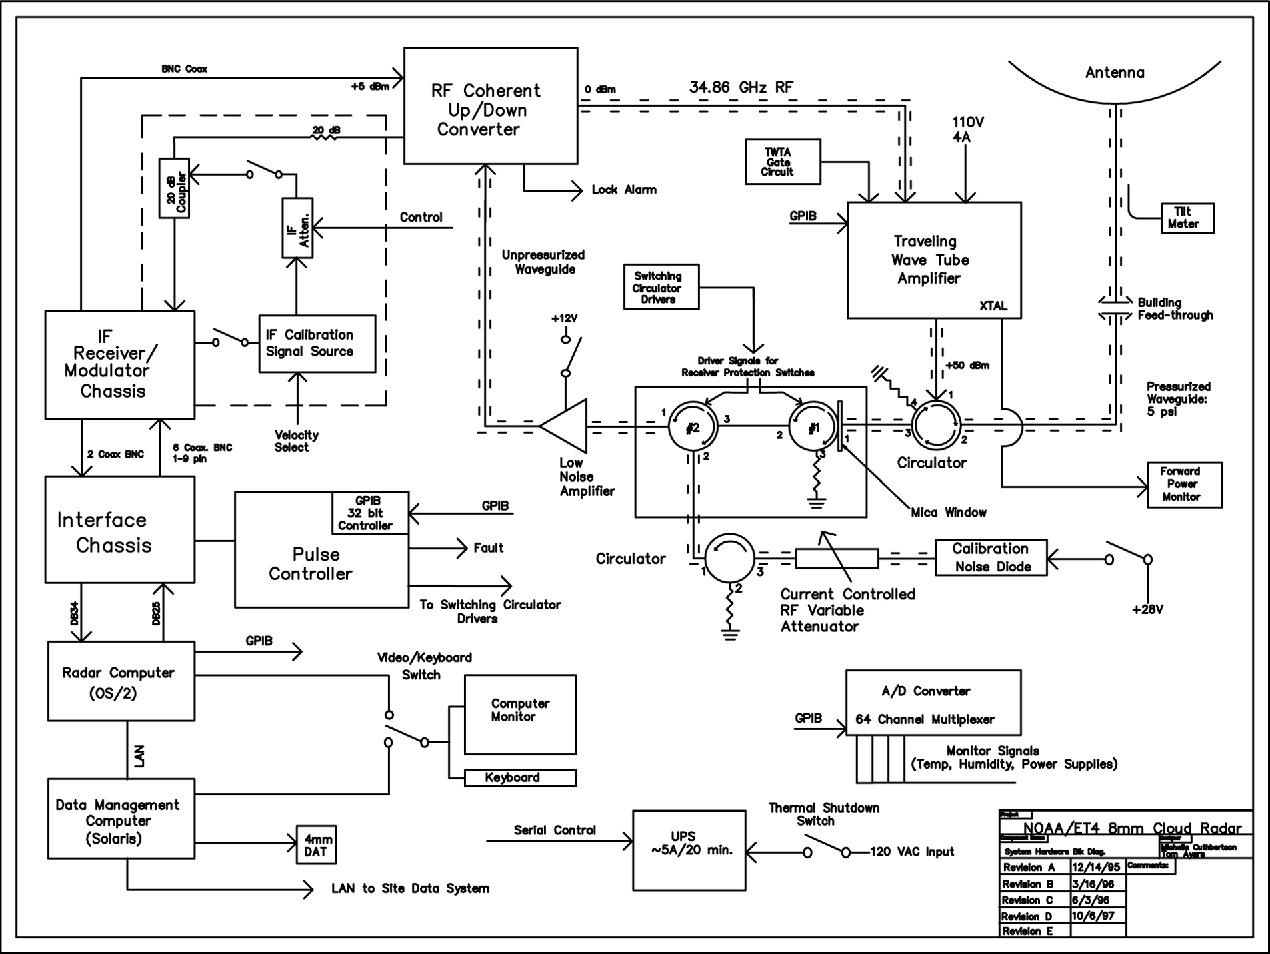 Block diagram of the NOAA ETL-designed ARM MMCR.